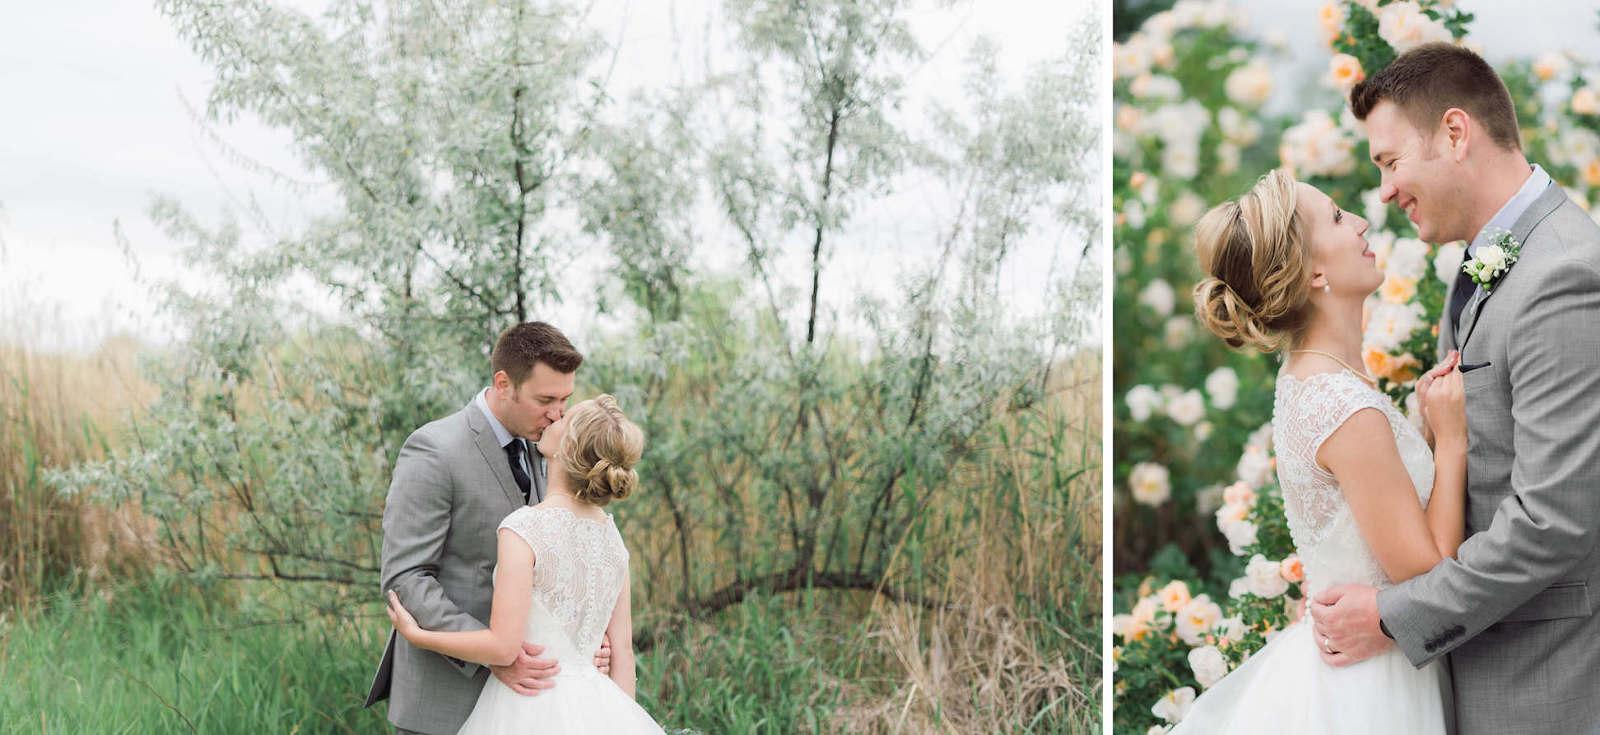 Beautiful wedding day portraits Ortonville Minnesota